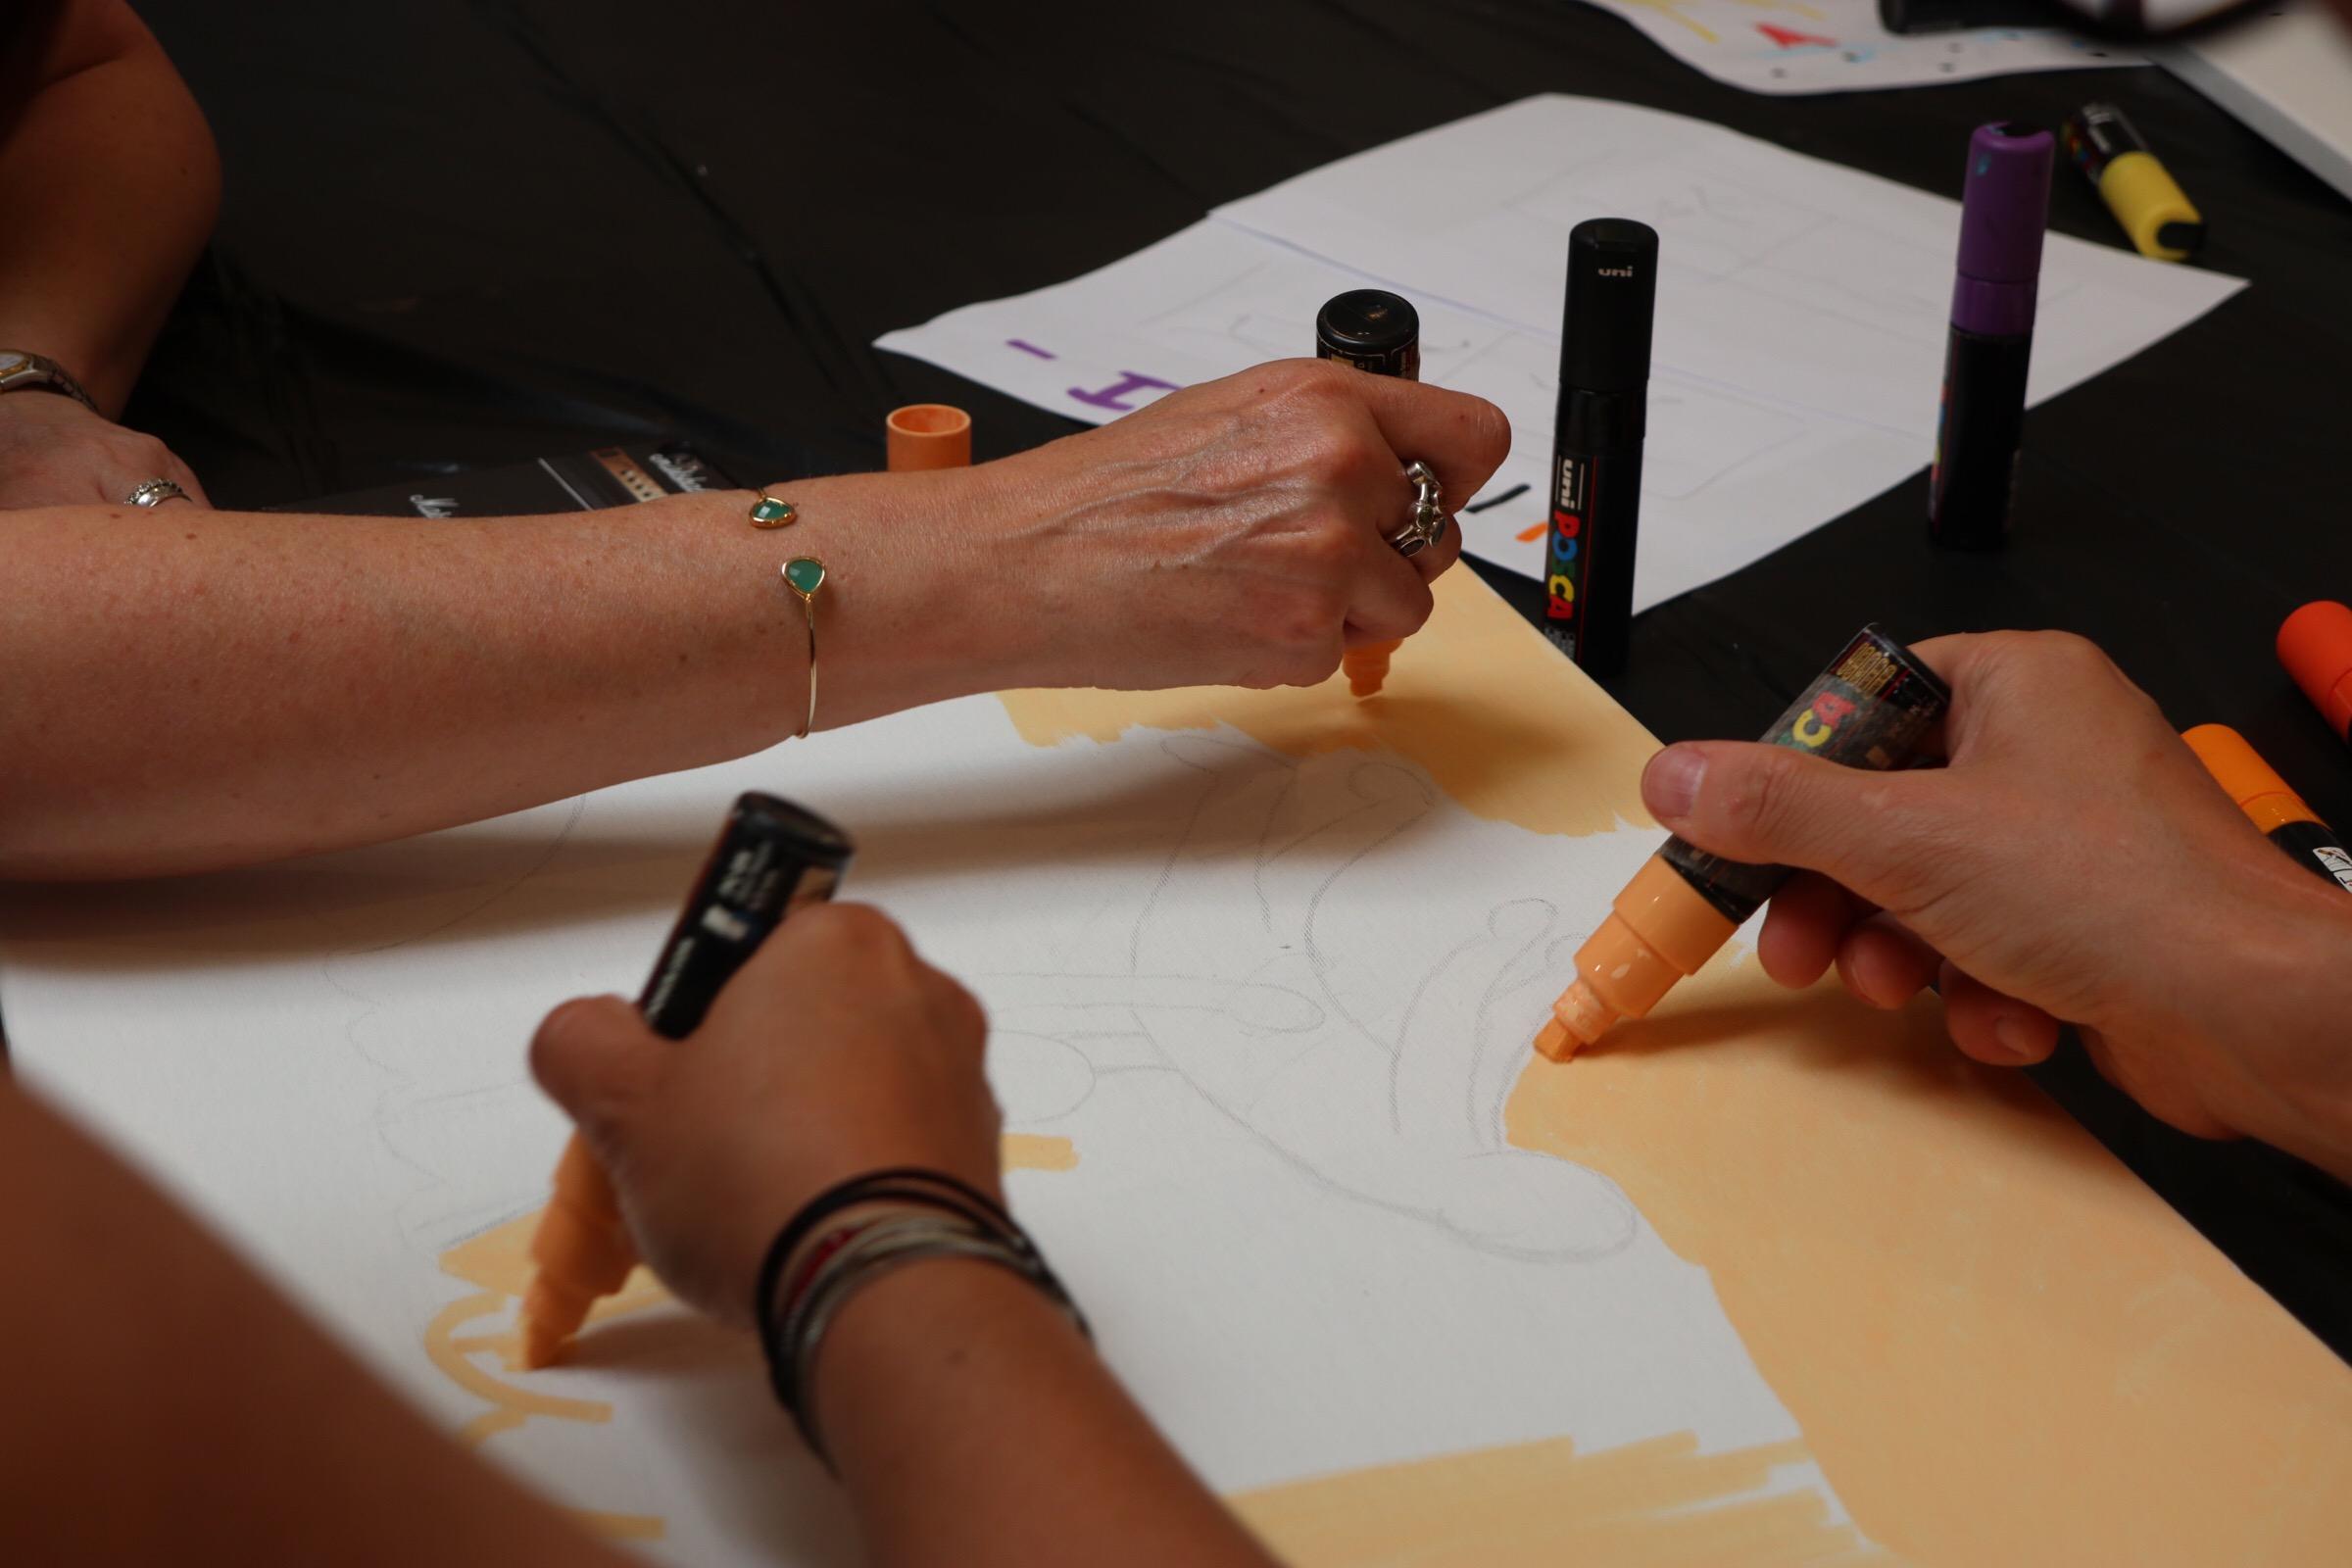 Animation team building keith haring pop art avec des maqueurs Poscas